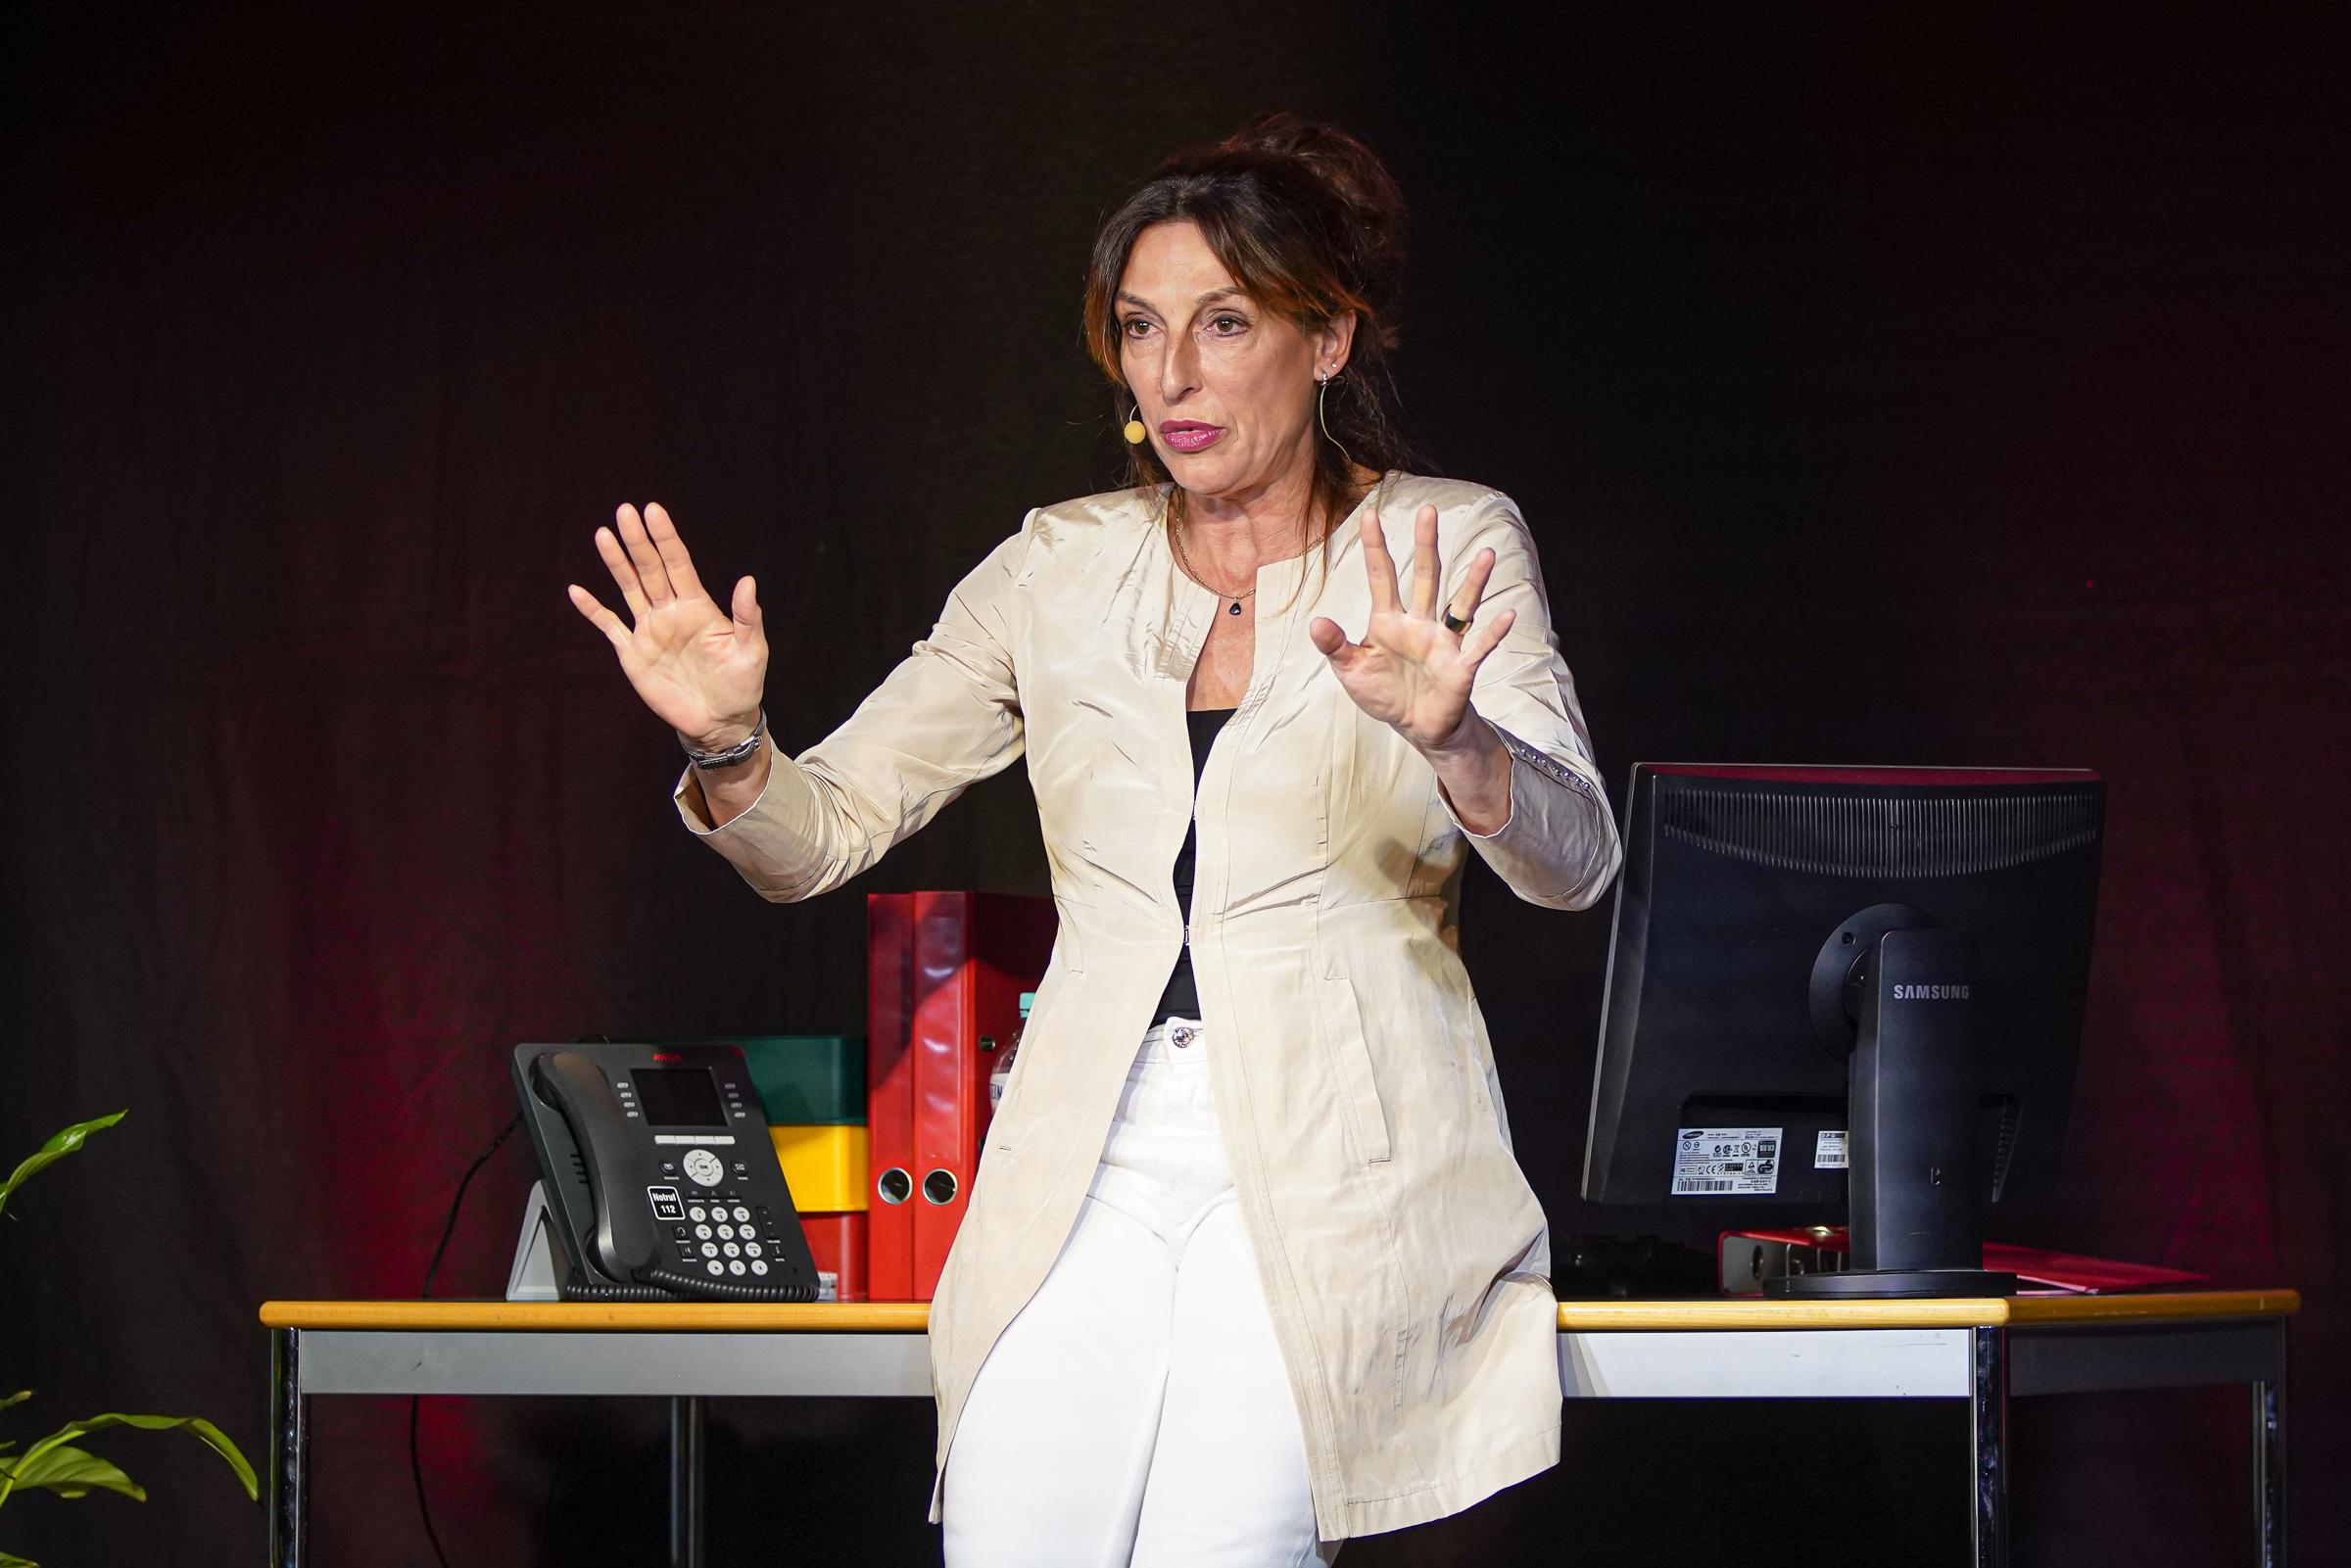 25.05.2019 - Andrea Volk 'Büro und Bekloppte'